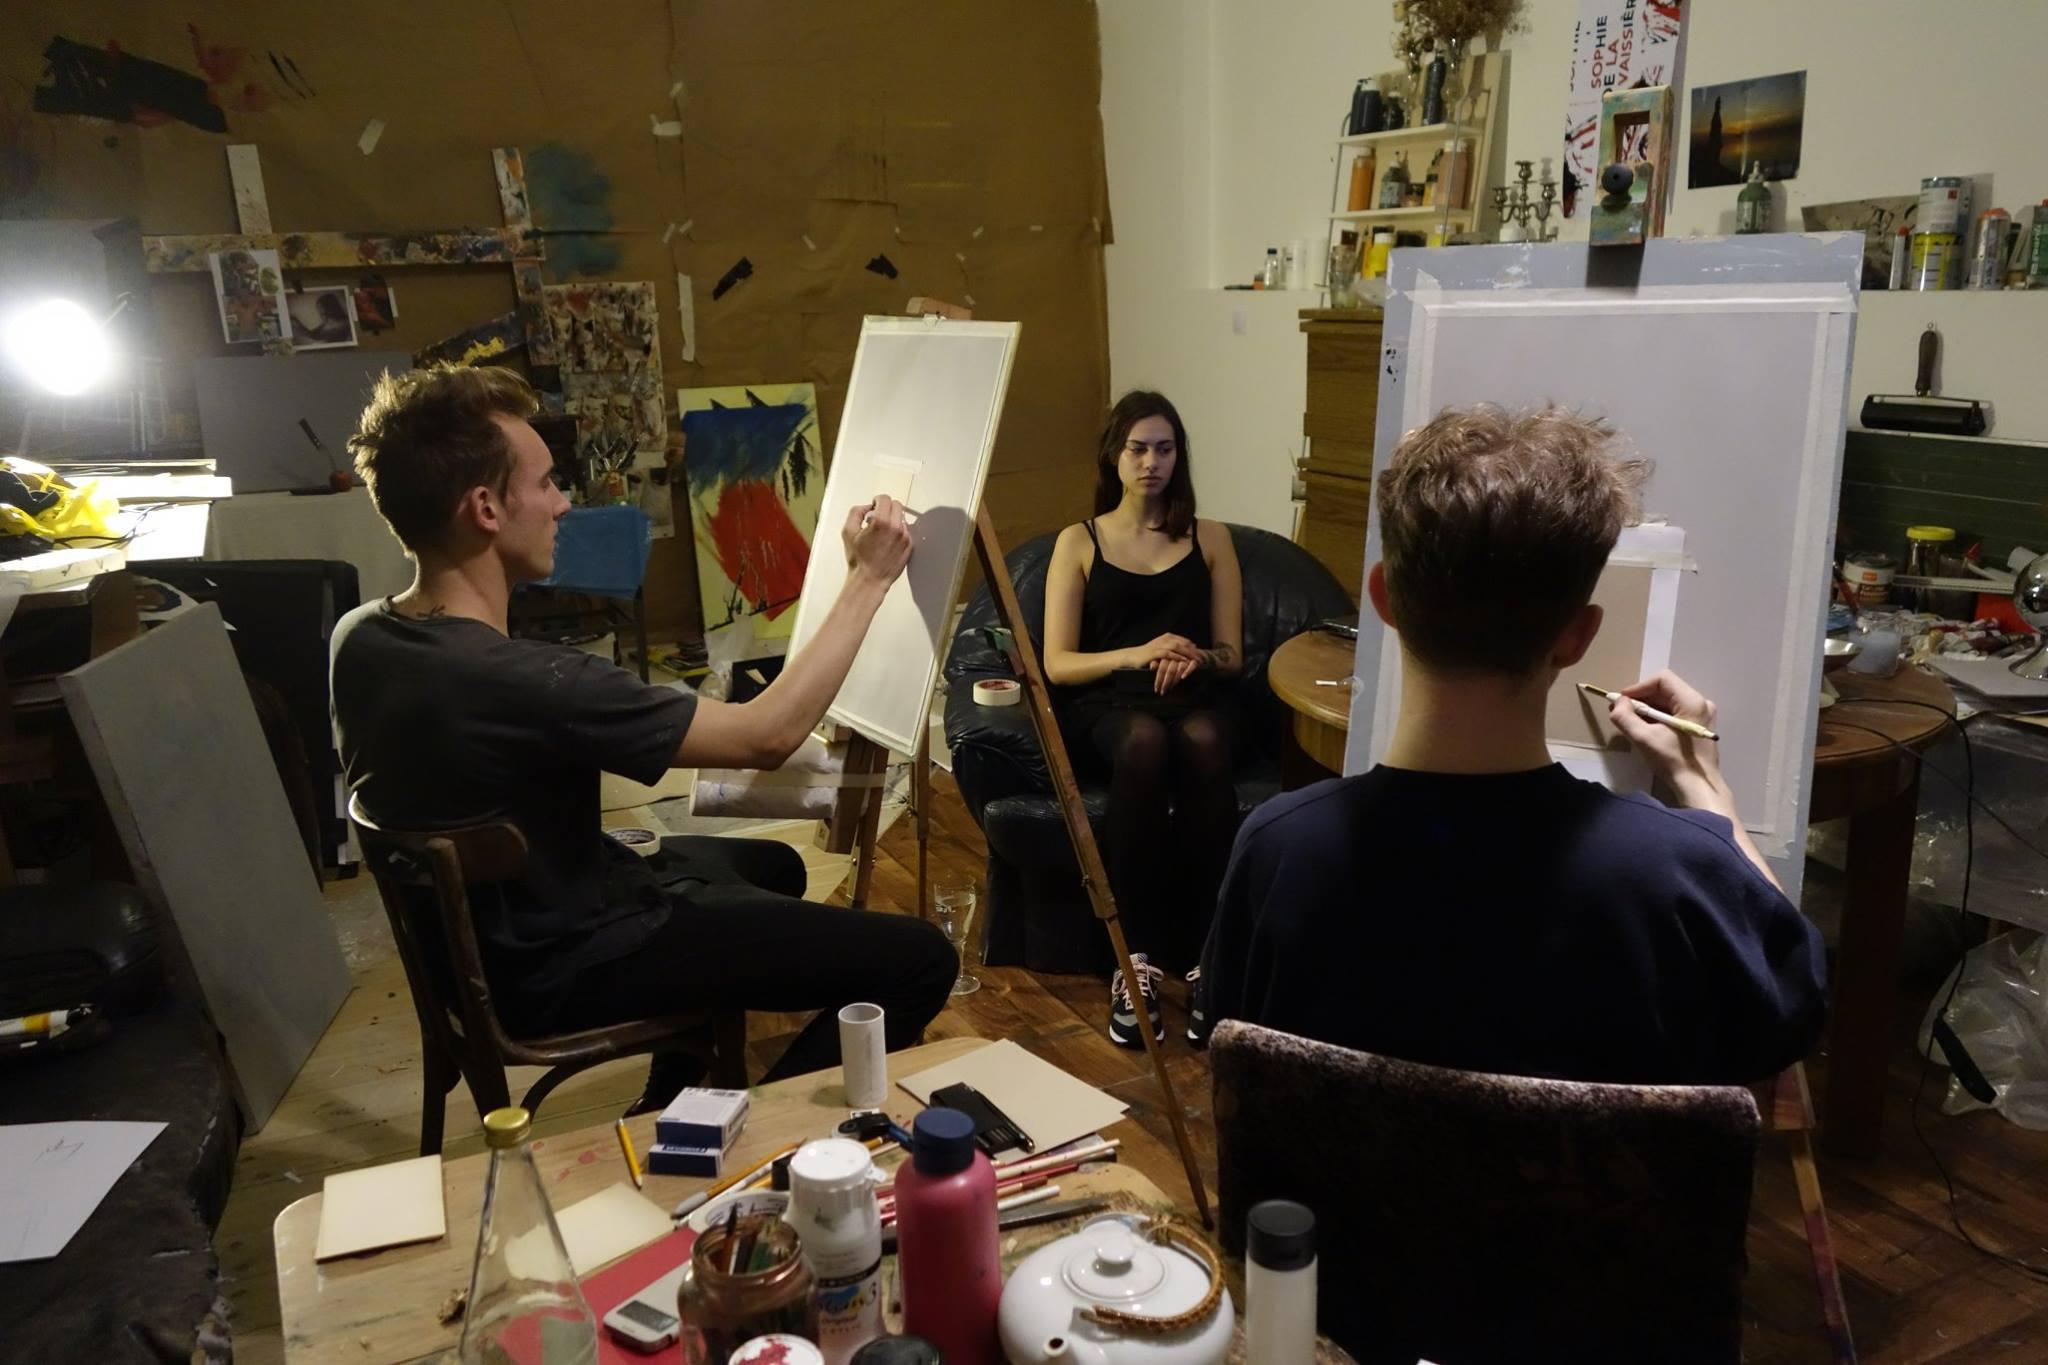 Session Gustav Sonntag / Feliks Stift Kollektiv exlex portraitmalerei